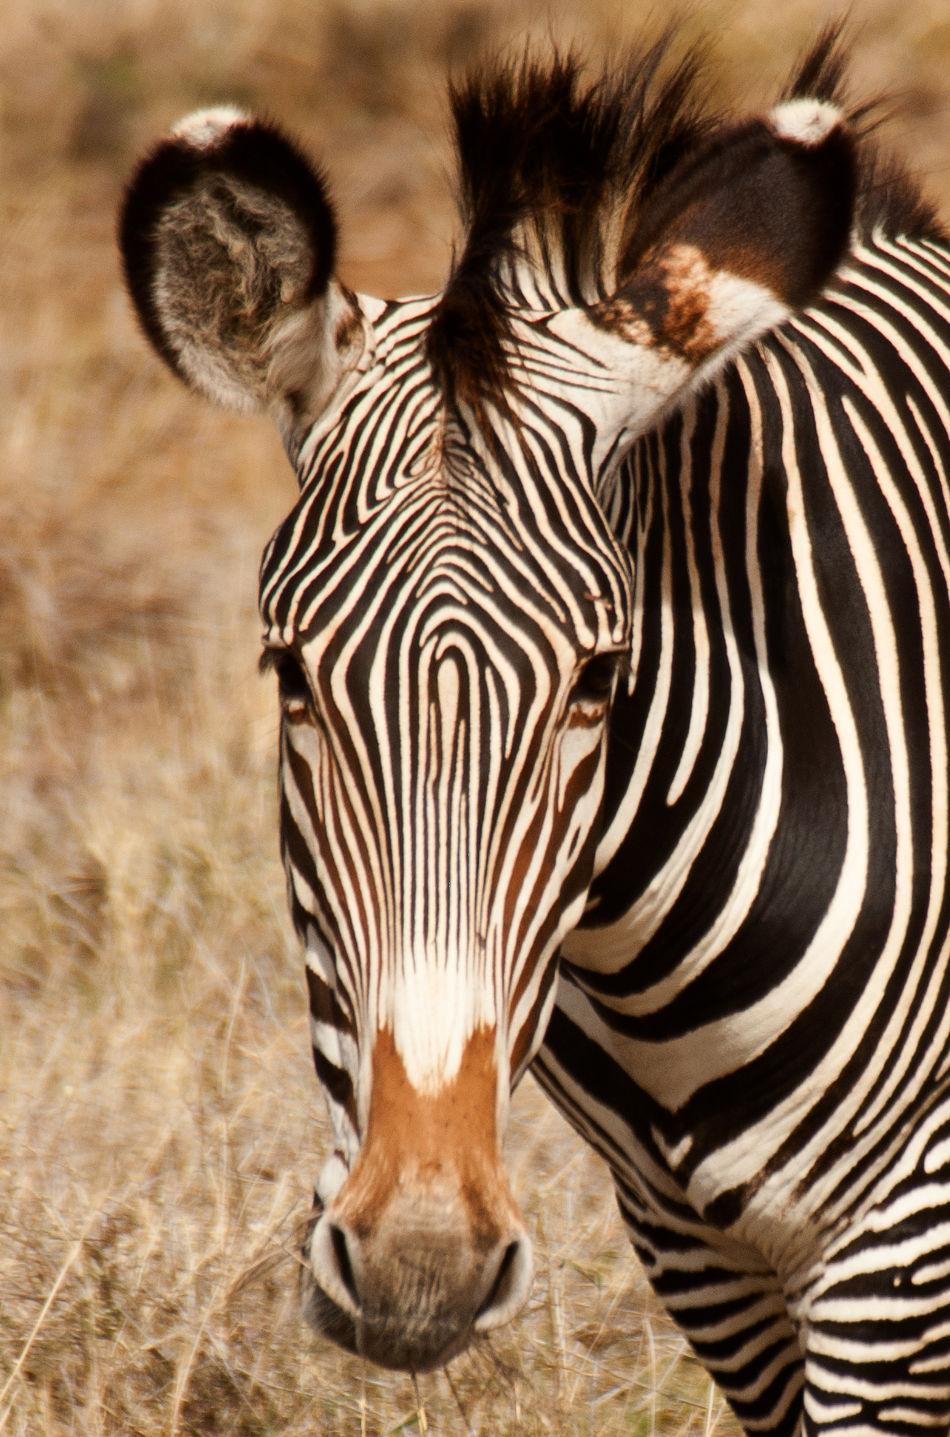 Africa Animal Themes Animal Wildlife Animals In The Wild Beauty In Nature Great Migration Mammal Nature No People One Animal Outdoors Safari Animals Serengeti National Park Tanzania Zebra